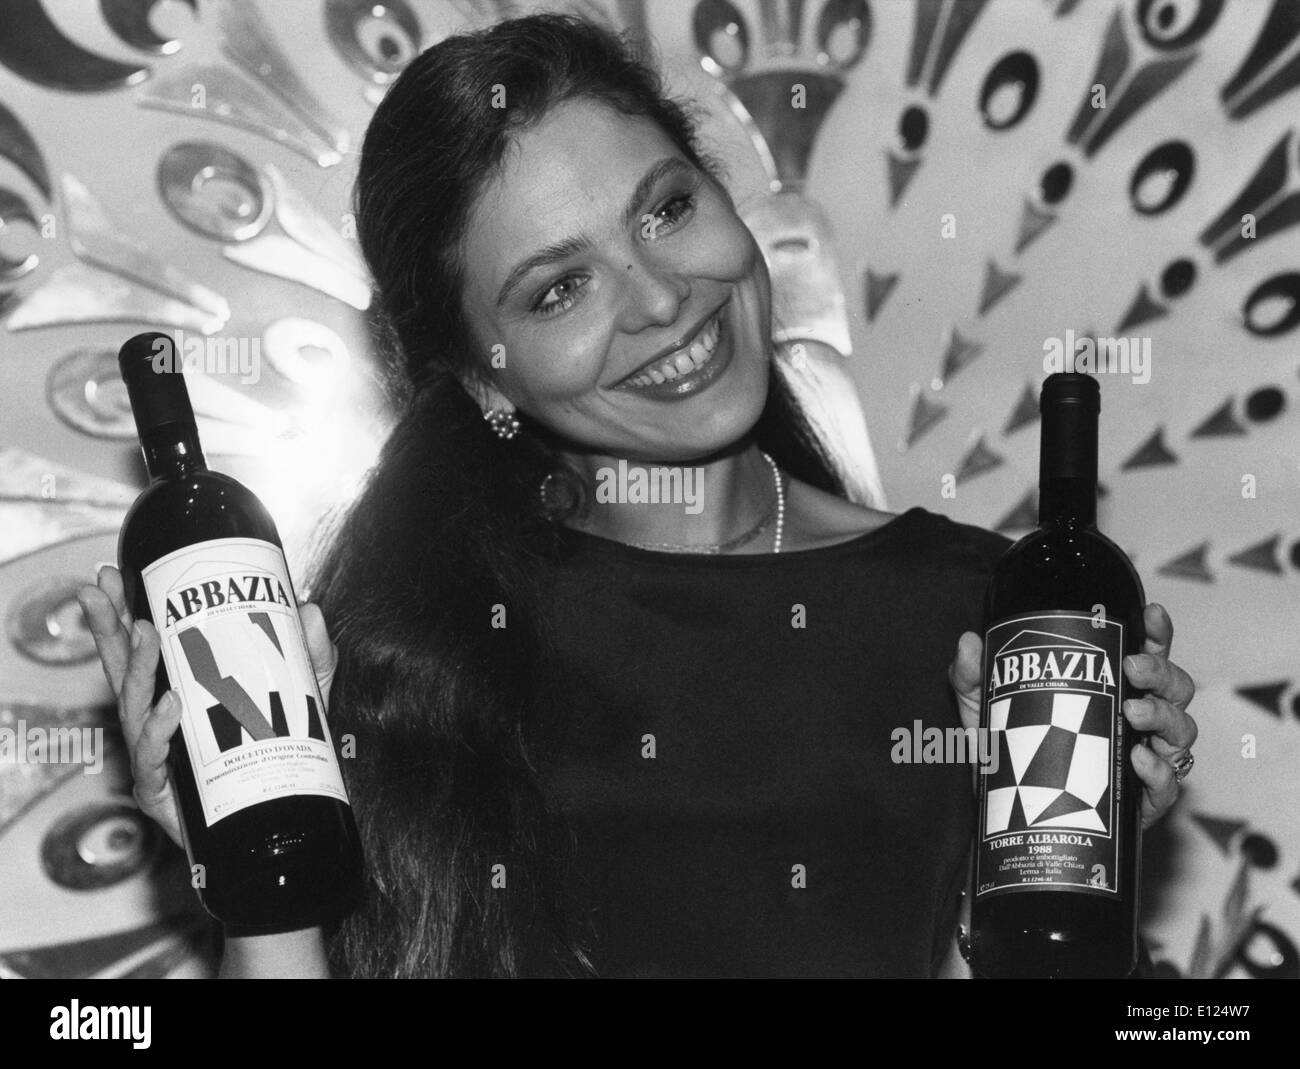 Mar. 2, 1991 - Zurich, Switzerland - Actress ORNELLA MUTI presented the wne of her own vineyard of Alto Monferrato. Stock Photo